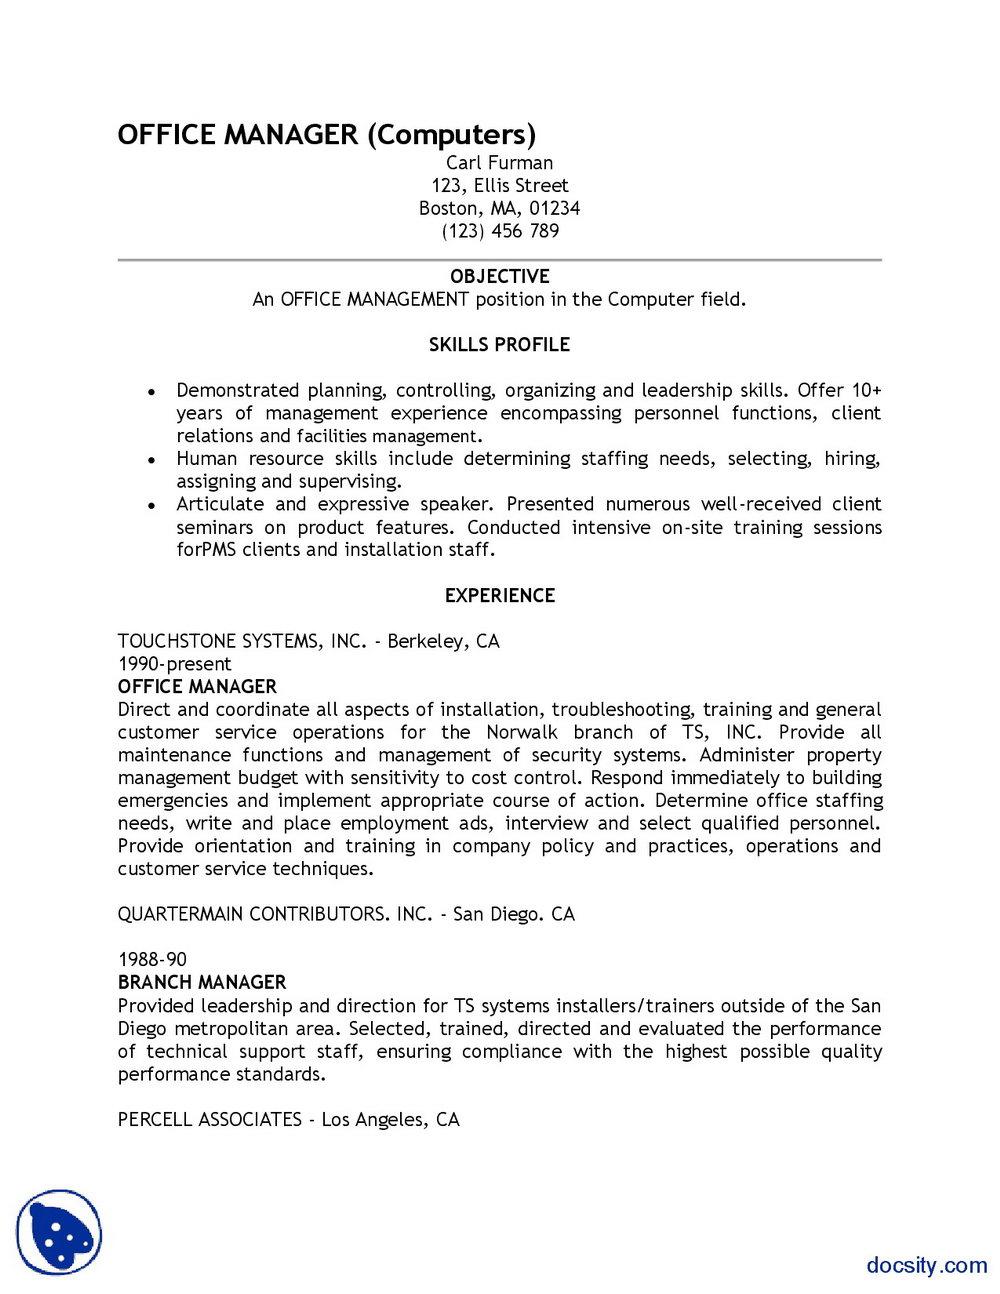 Resume Writing Service San Diego Ca